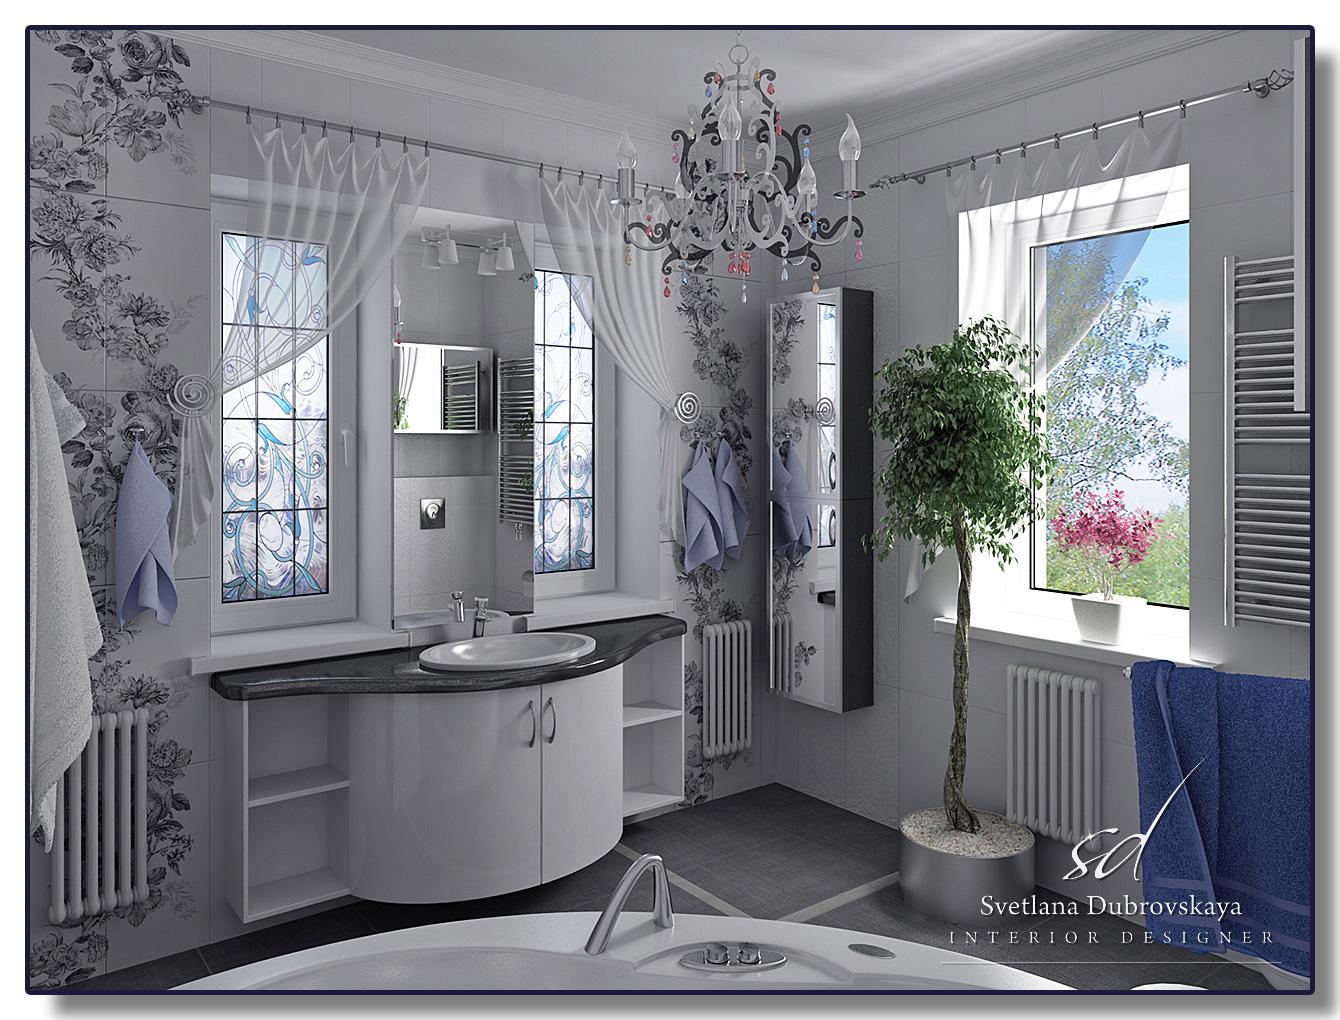 Ремонт и отделка квартиры и дома